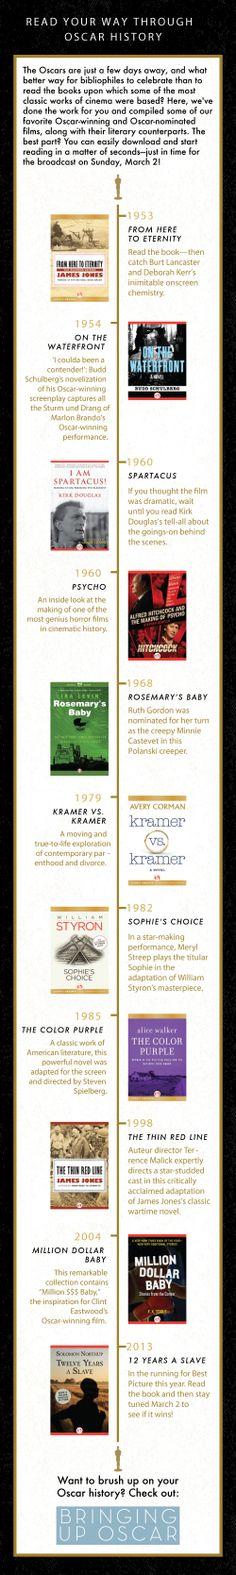 Read Your Way through Oscar History